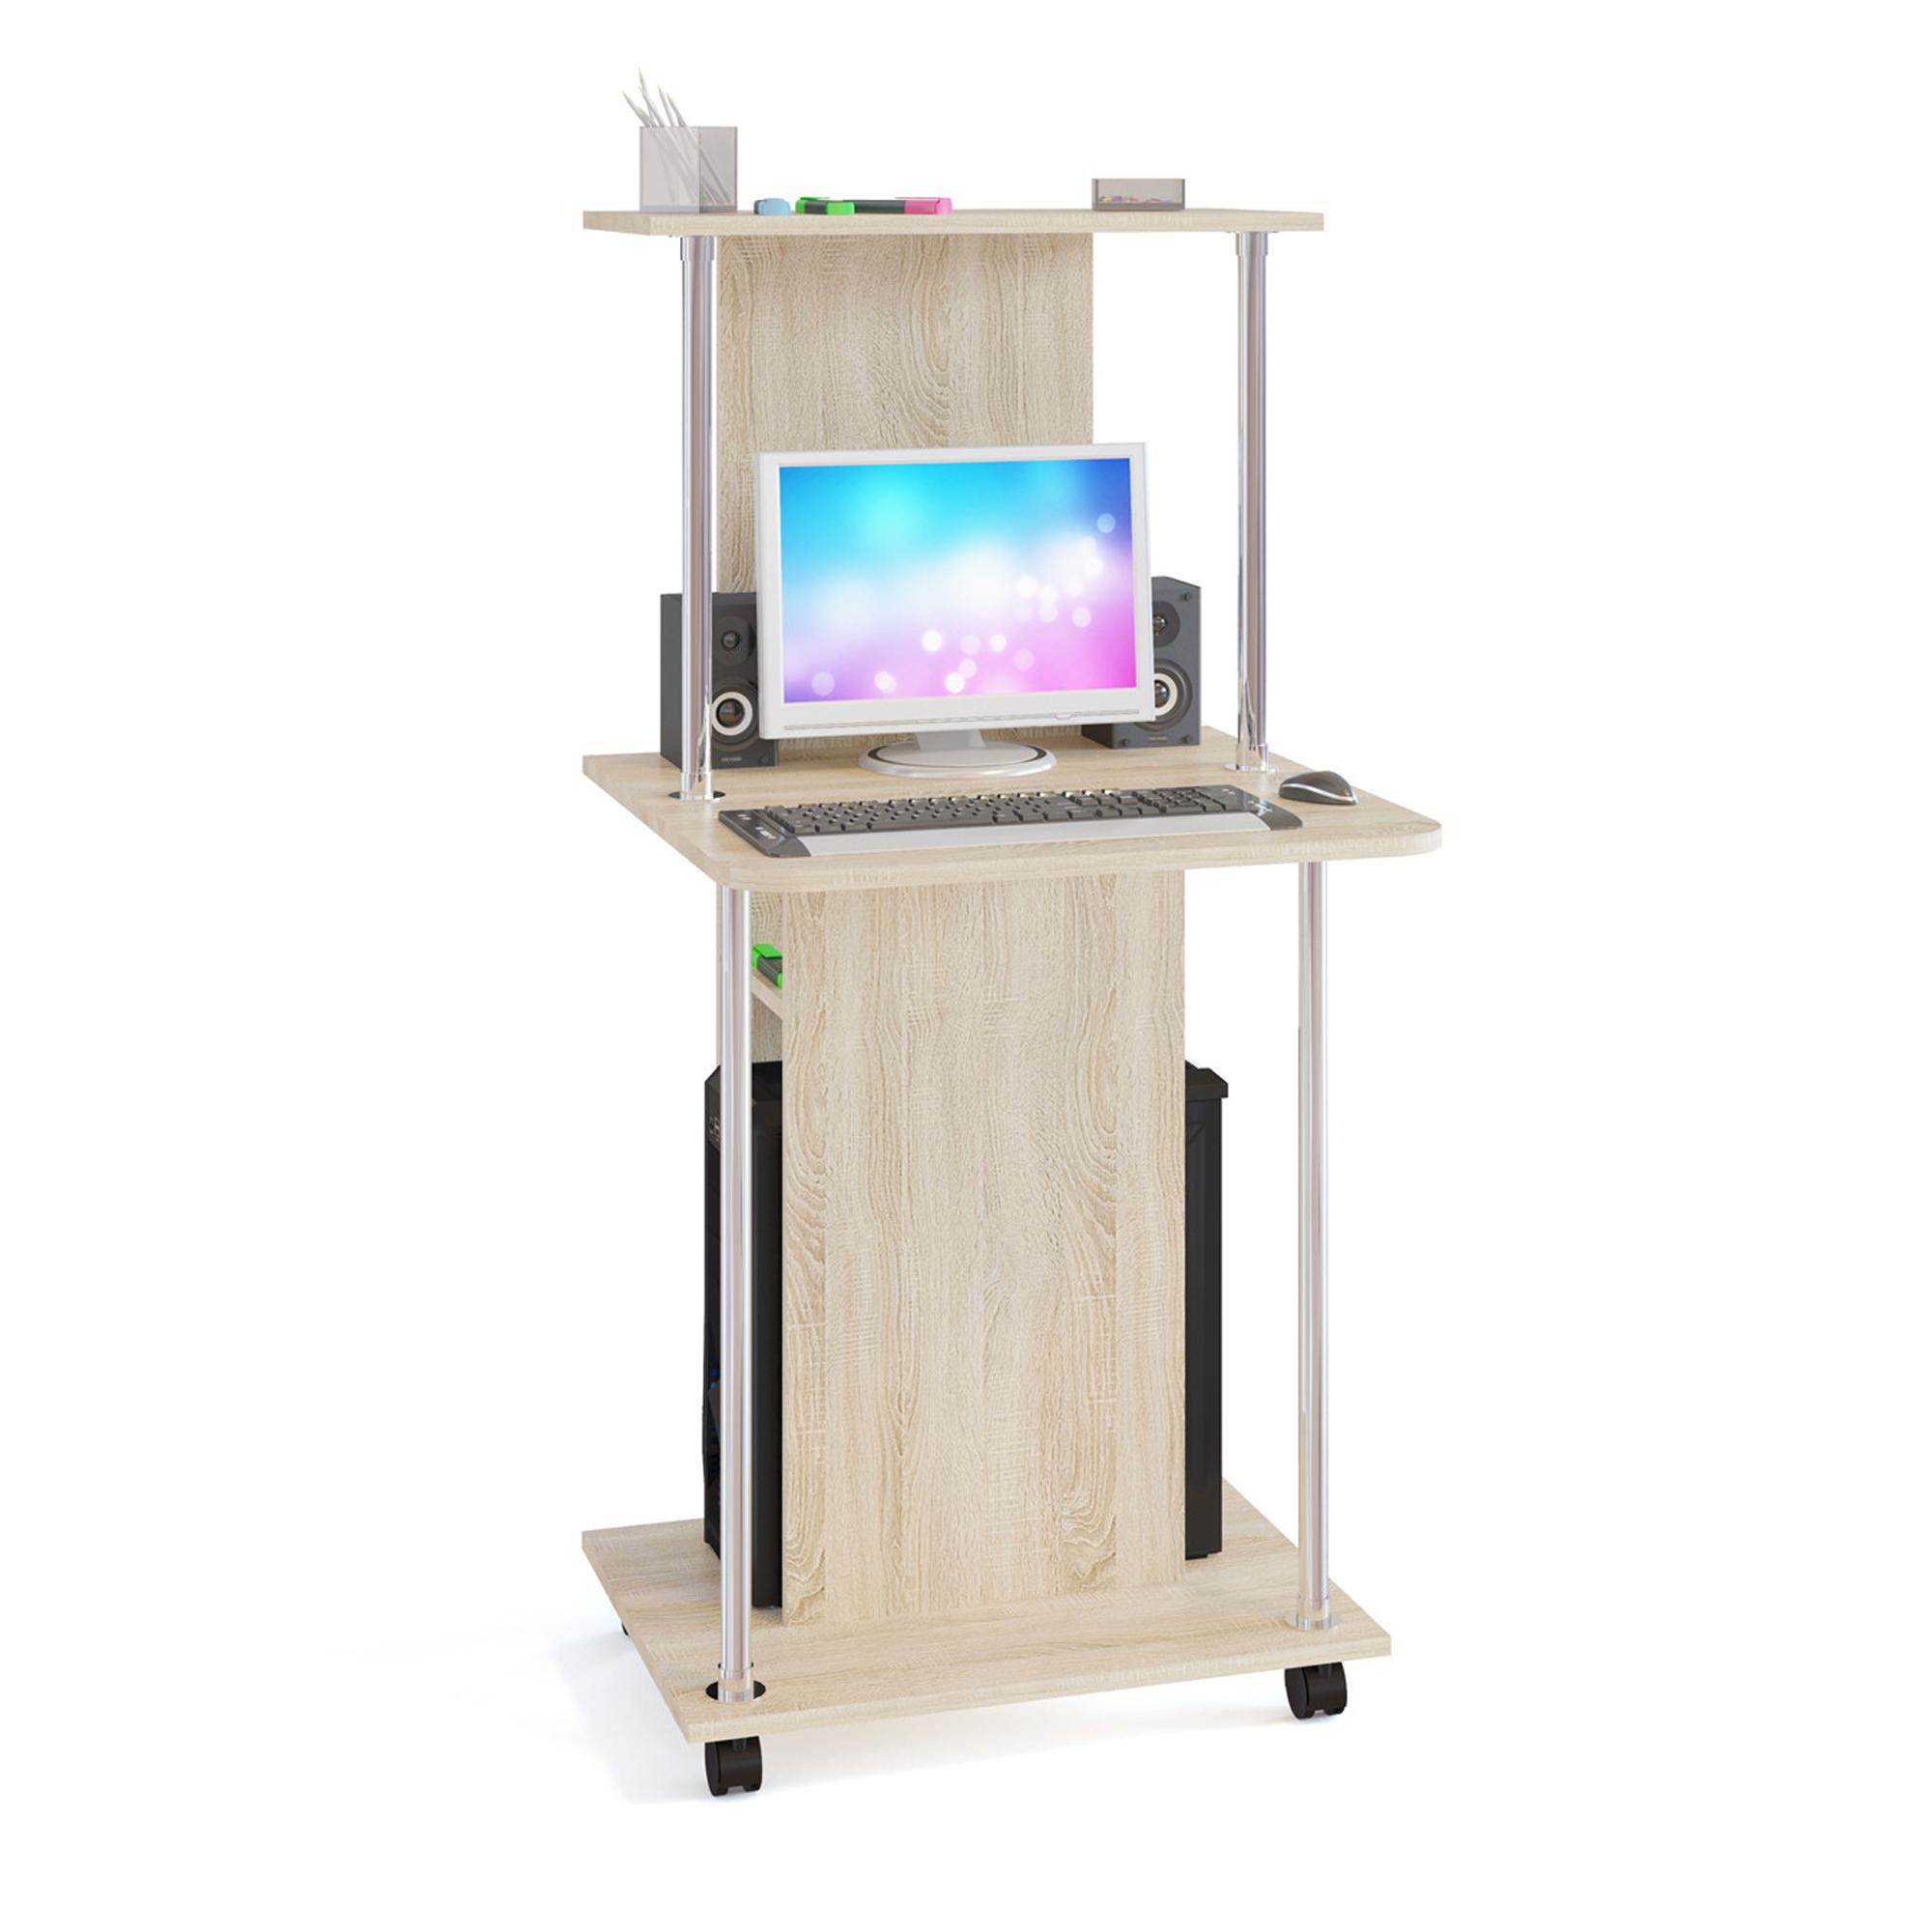 Компьютерный стол СОКОЛ КСТ-12 60x60x126, дуб сонома